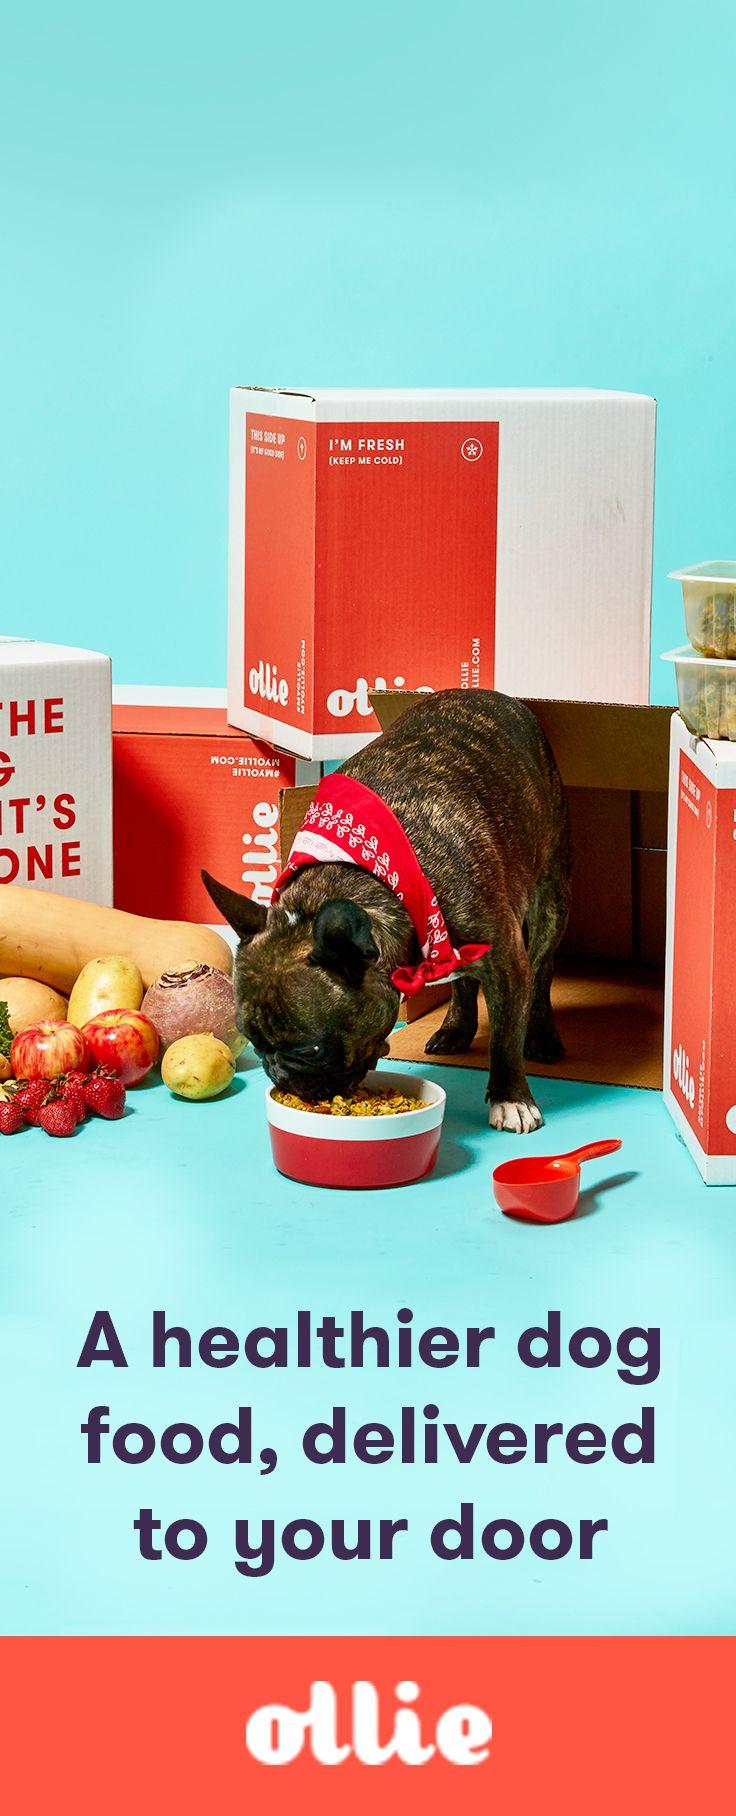 Meet Ollie - fresh dog food that will make them feel as good as it tastes - we guarantee it.